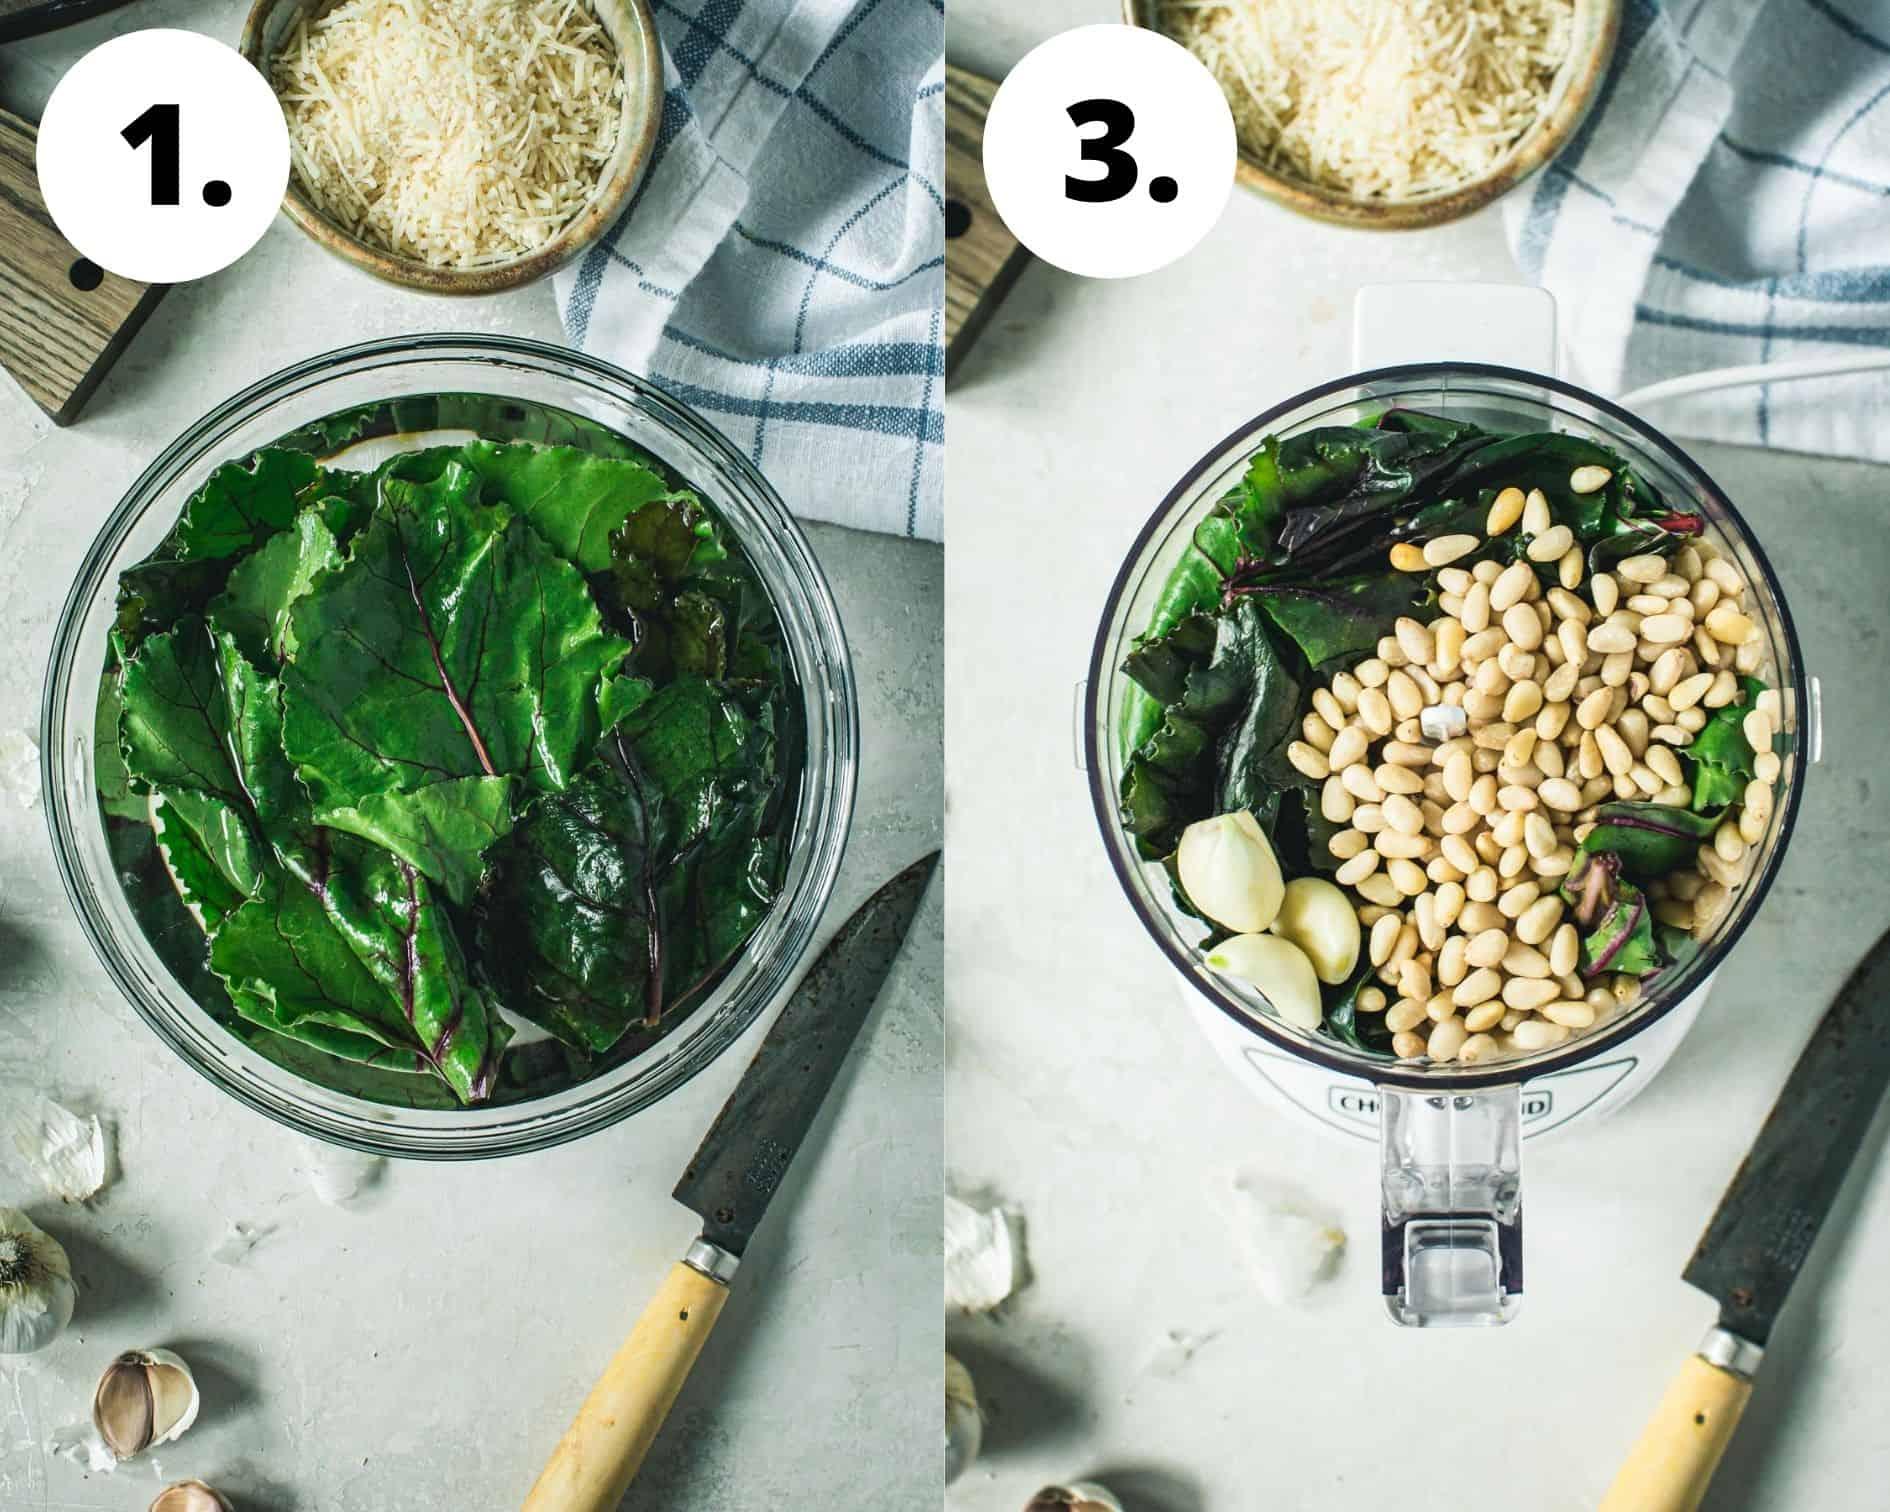 Beet greens pesto process steps 1 and 2.